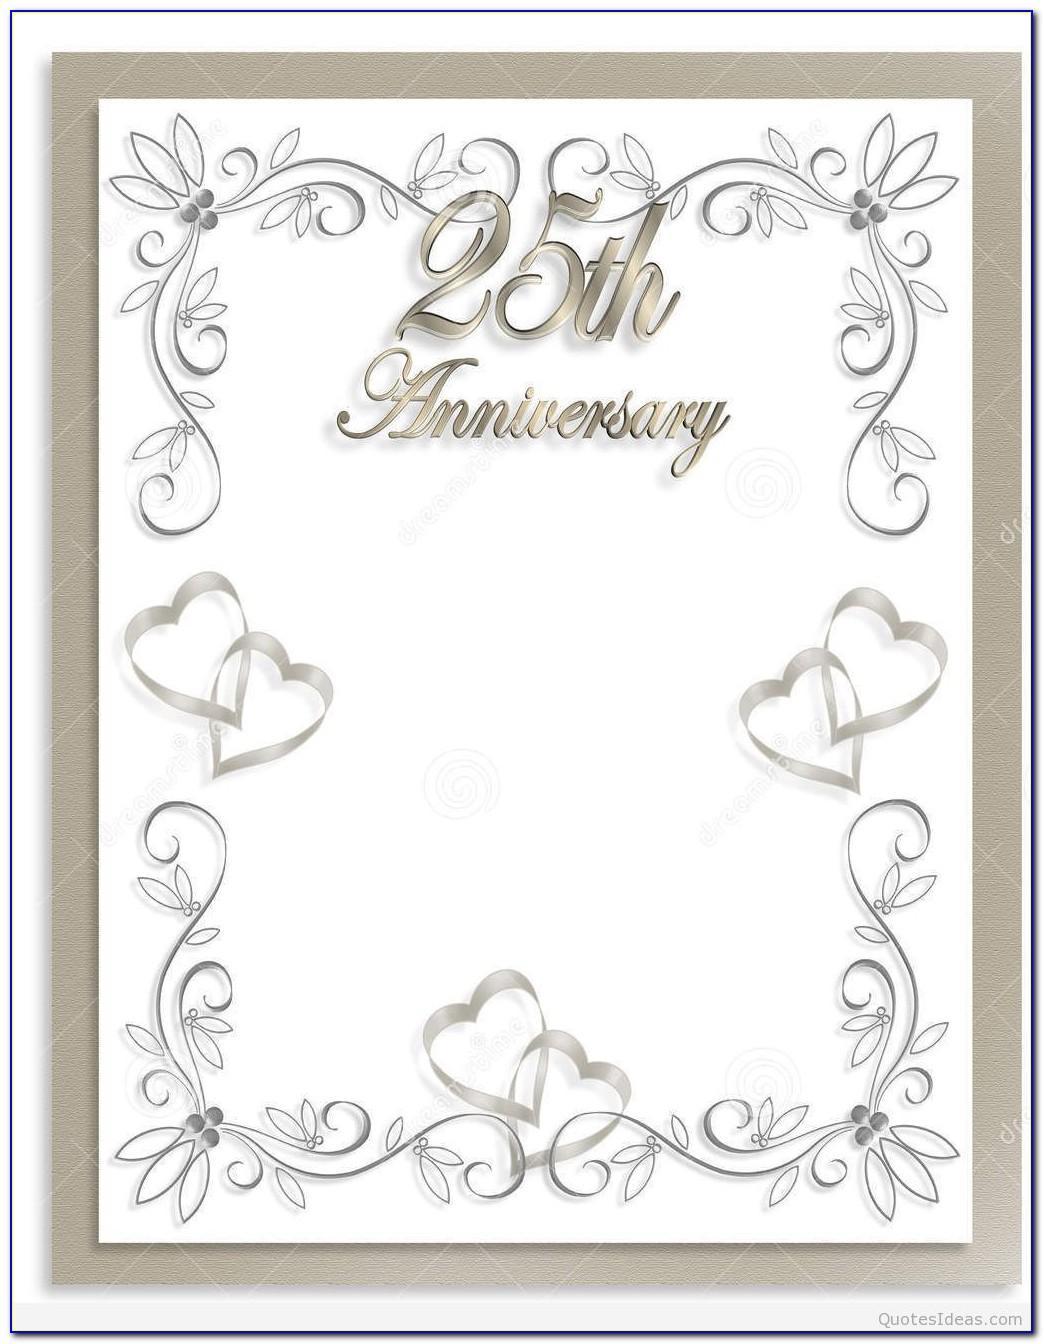 25th Anniversary Invitation Templates Free